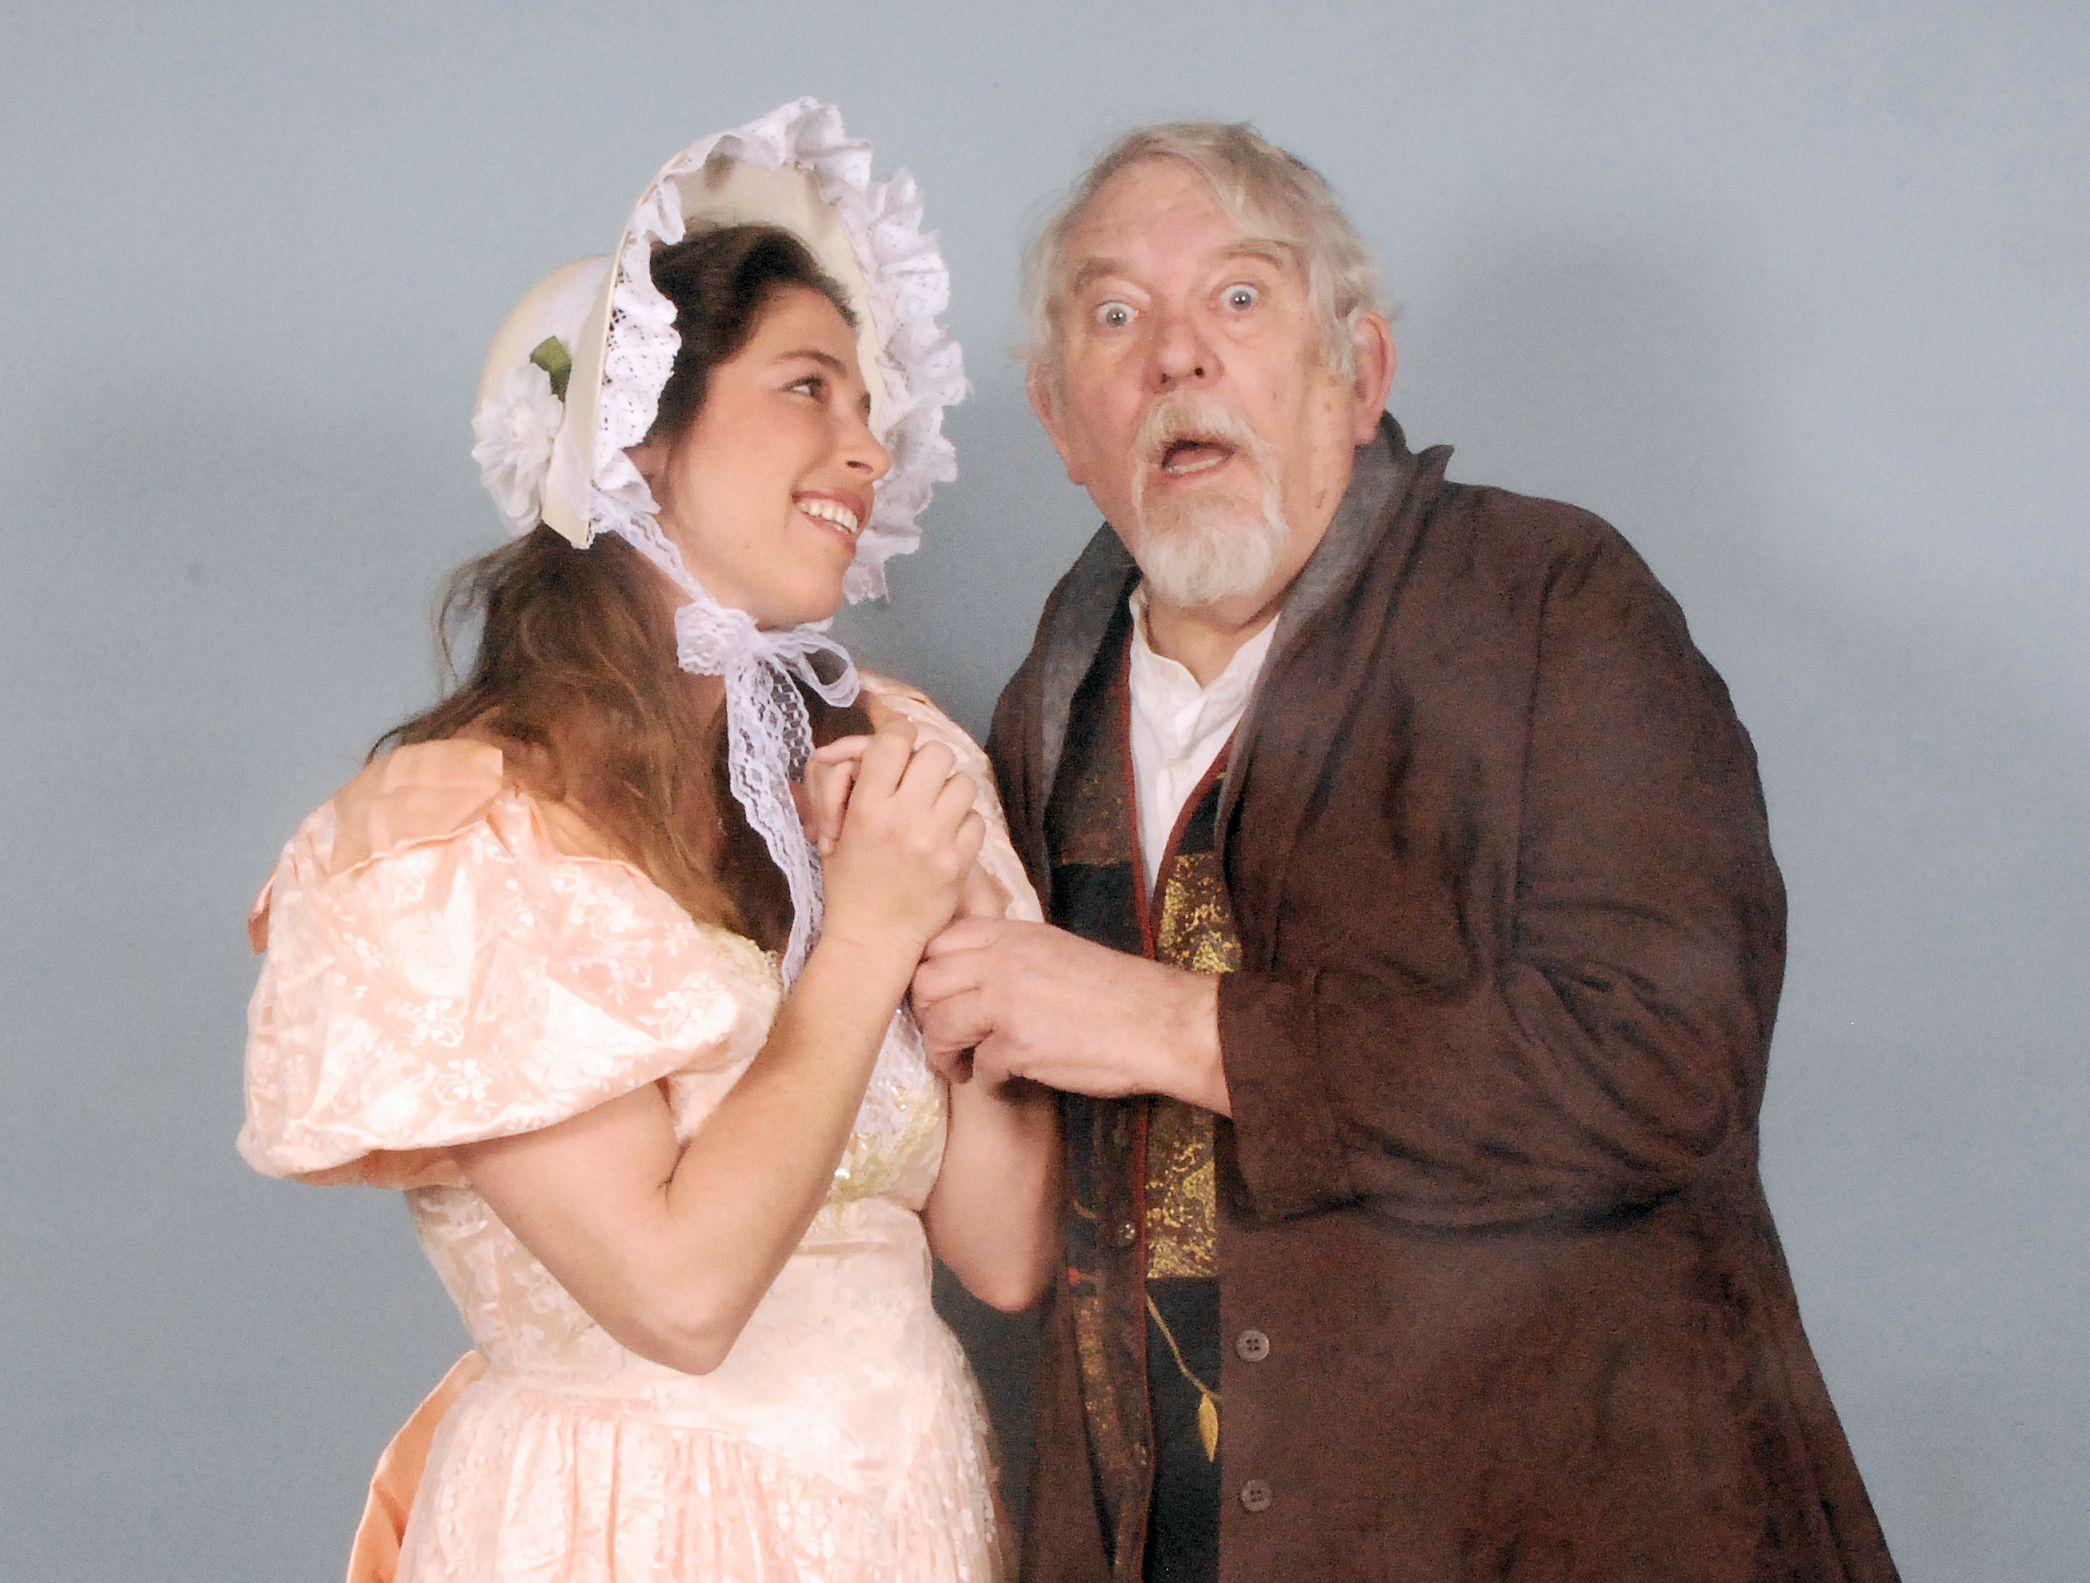 Brett Kroeger as Constance with Jim Cooper